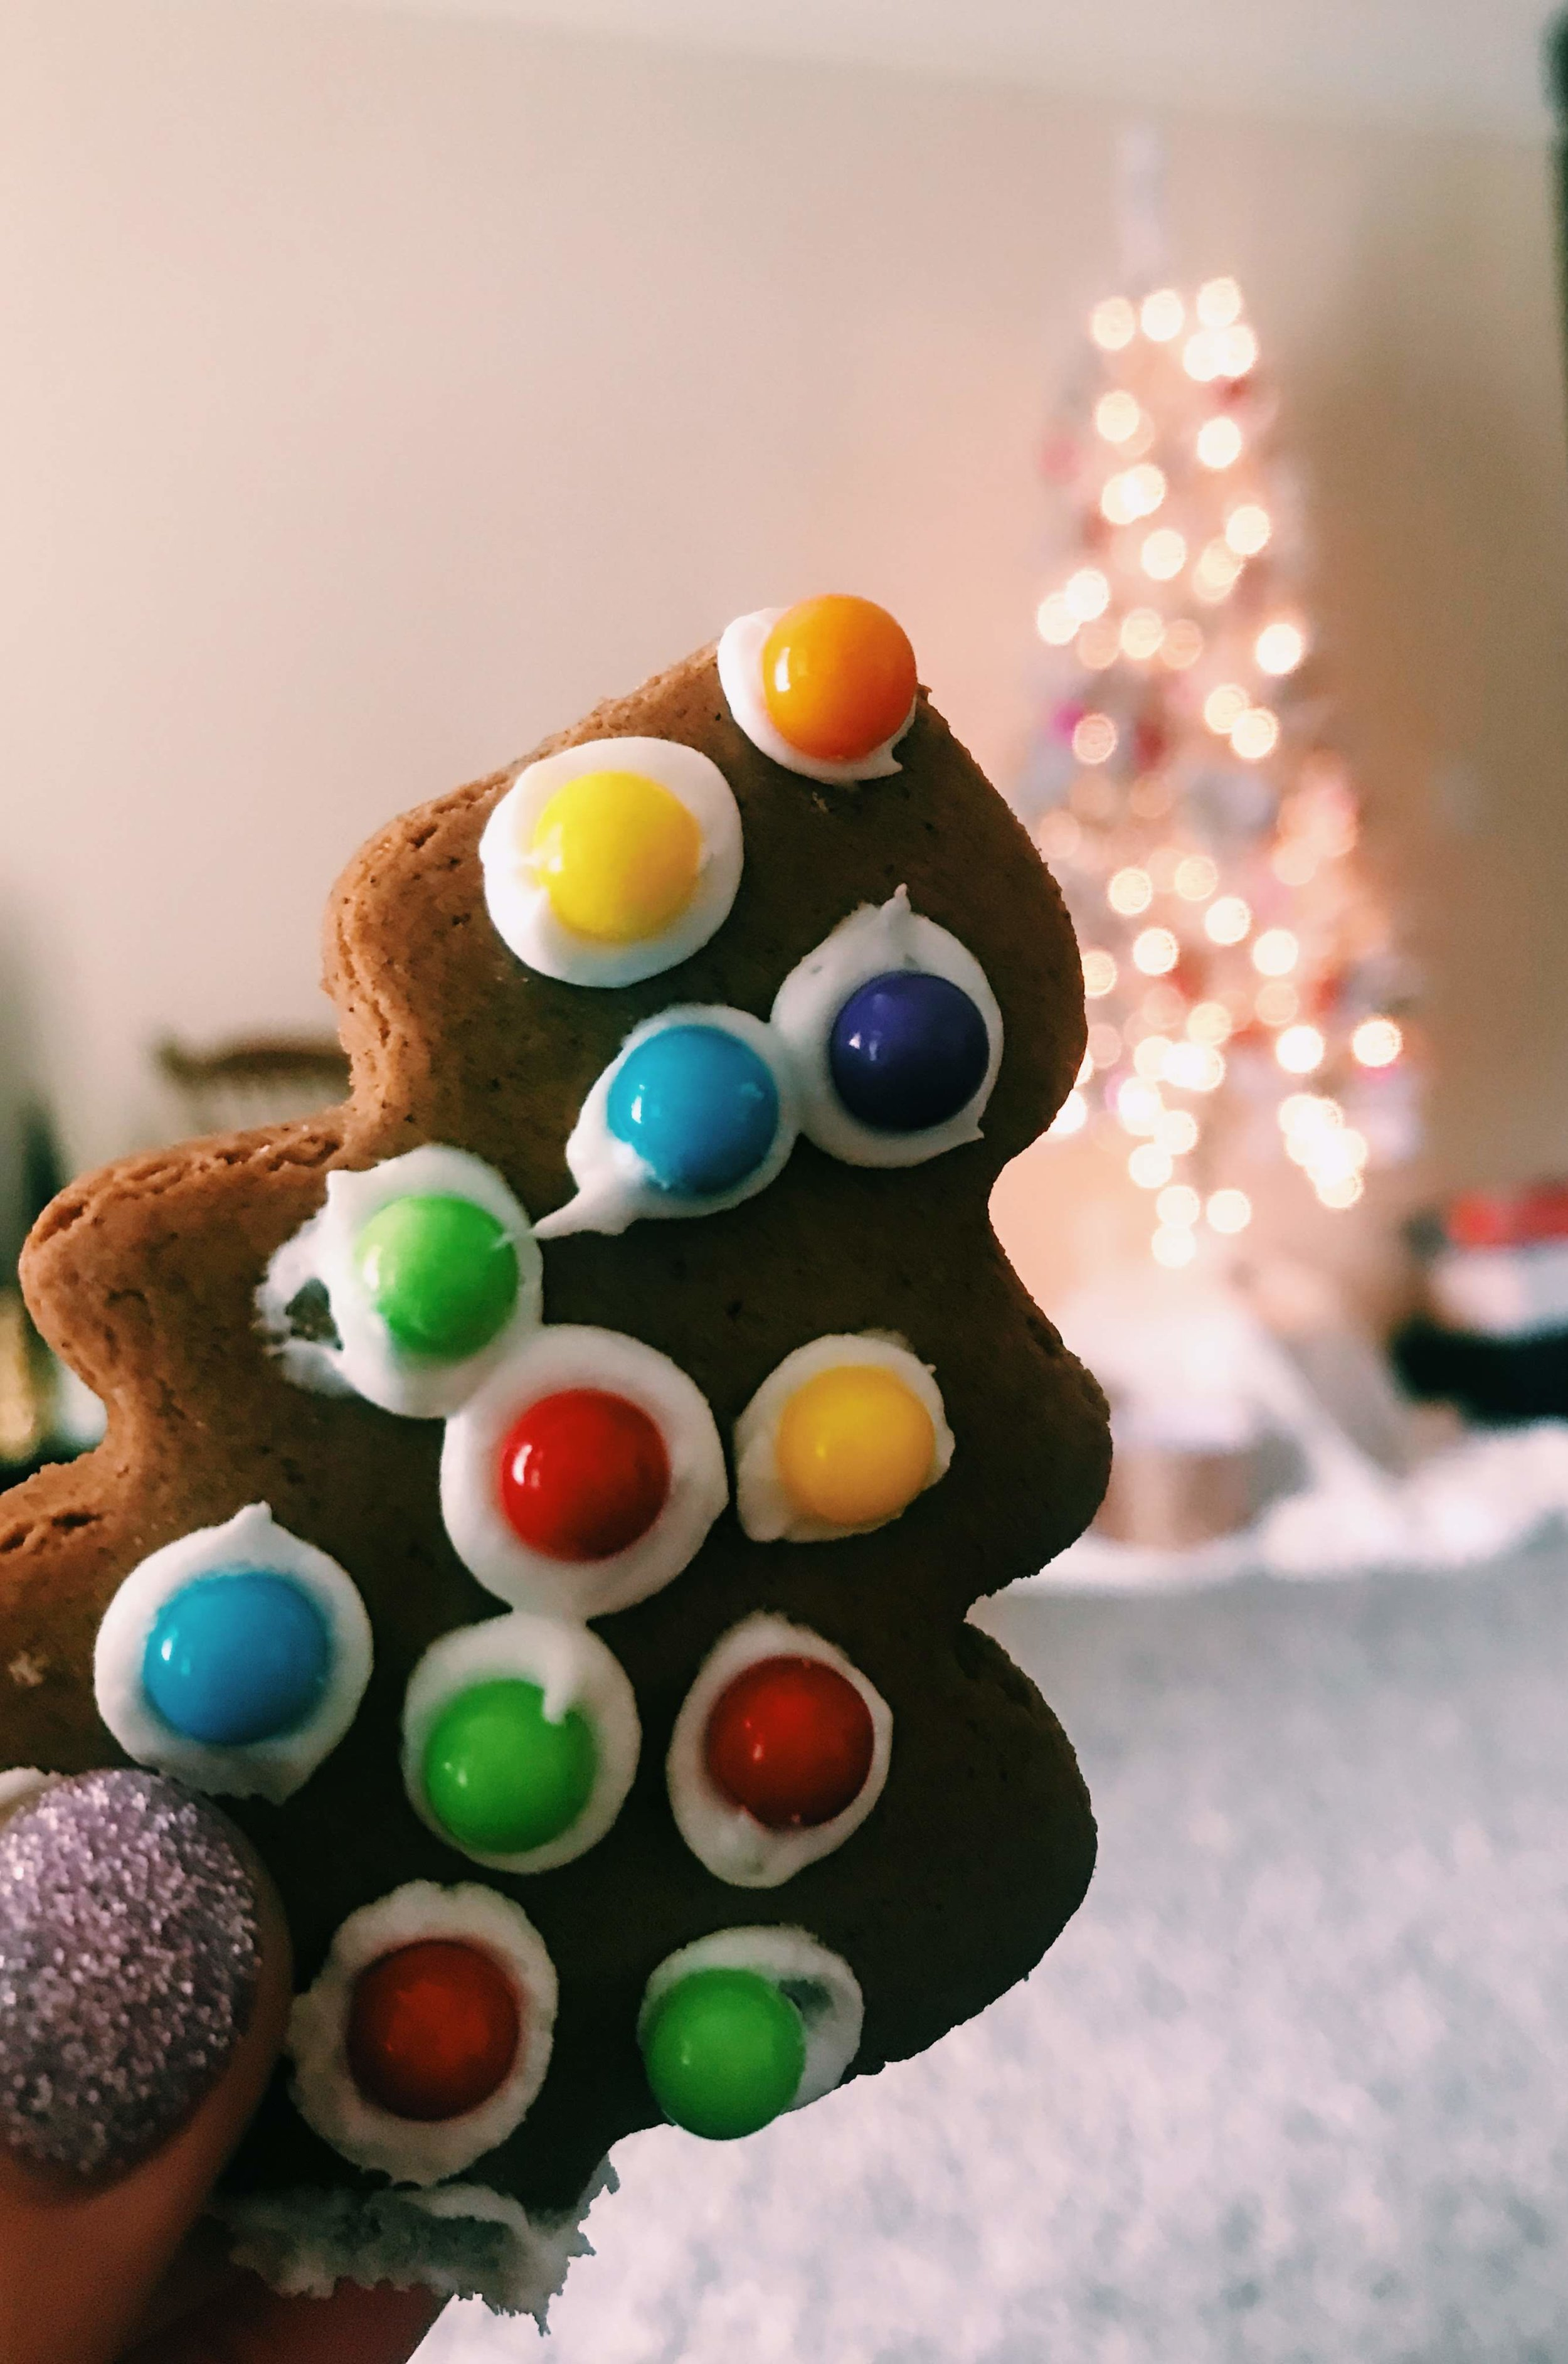 Three Heel Clicks - Cheerful Holiday Posts for Everyone (3).jpg